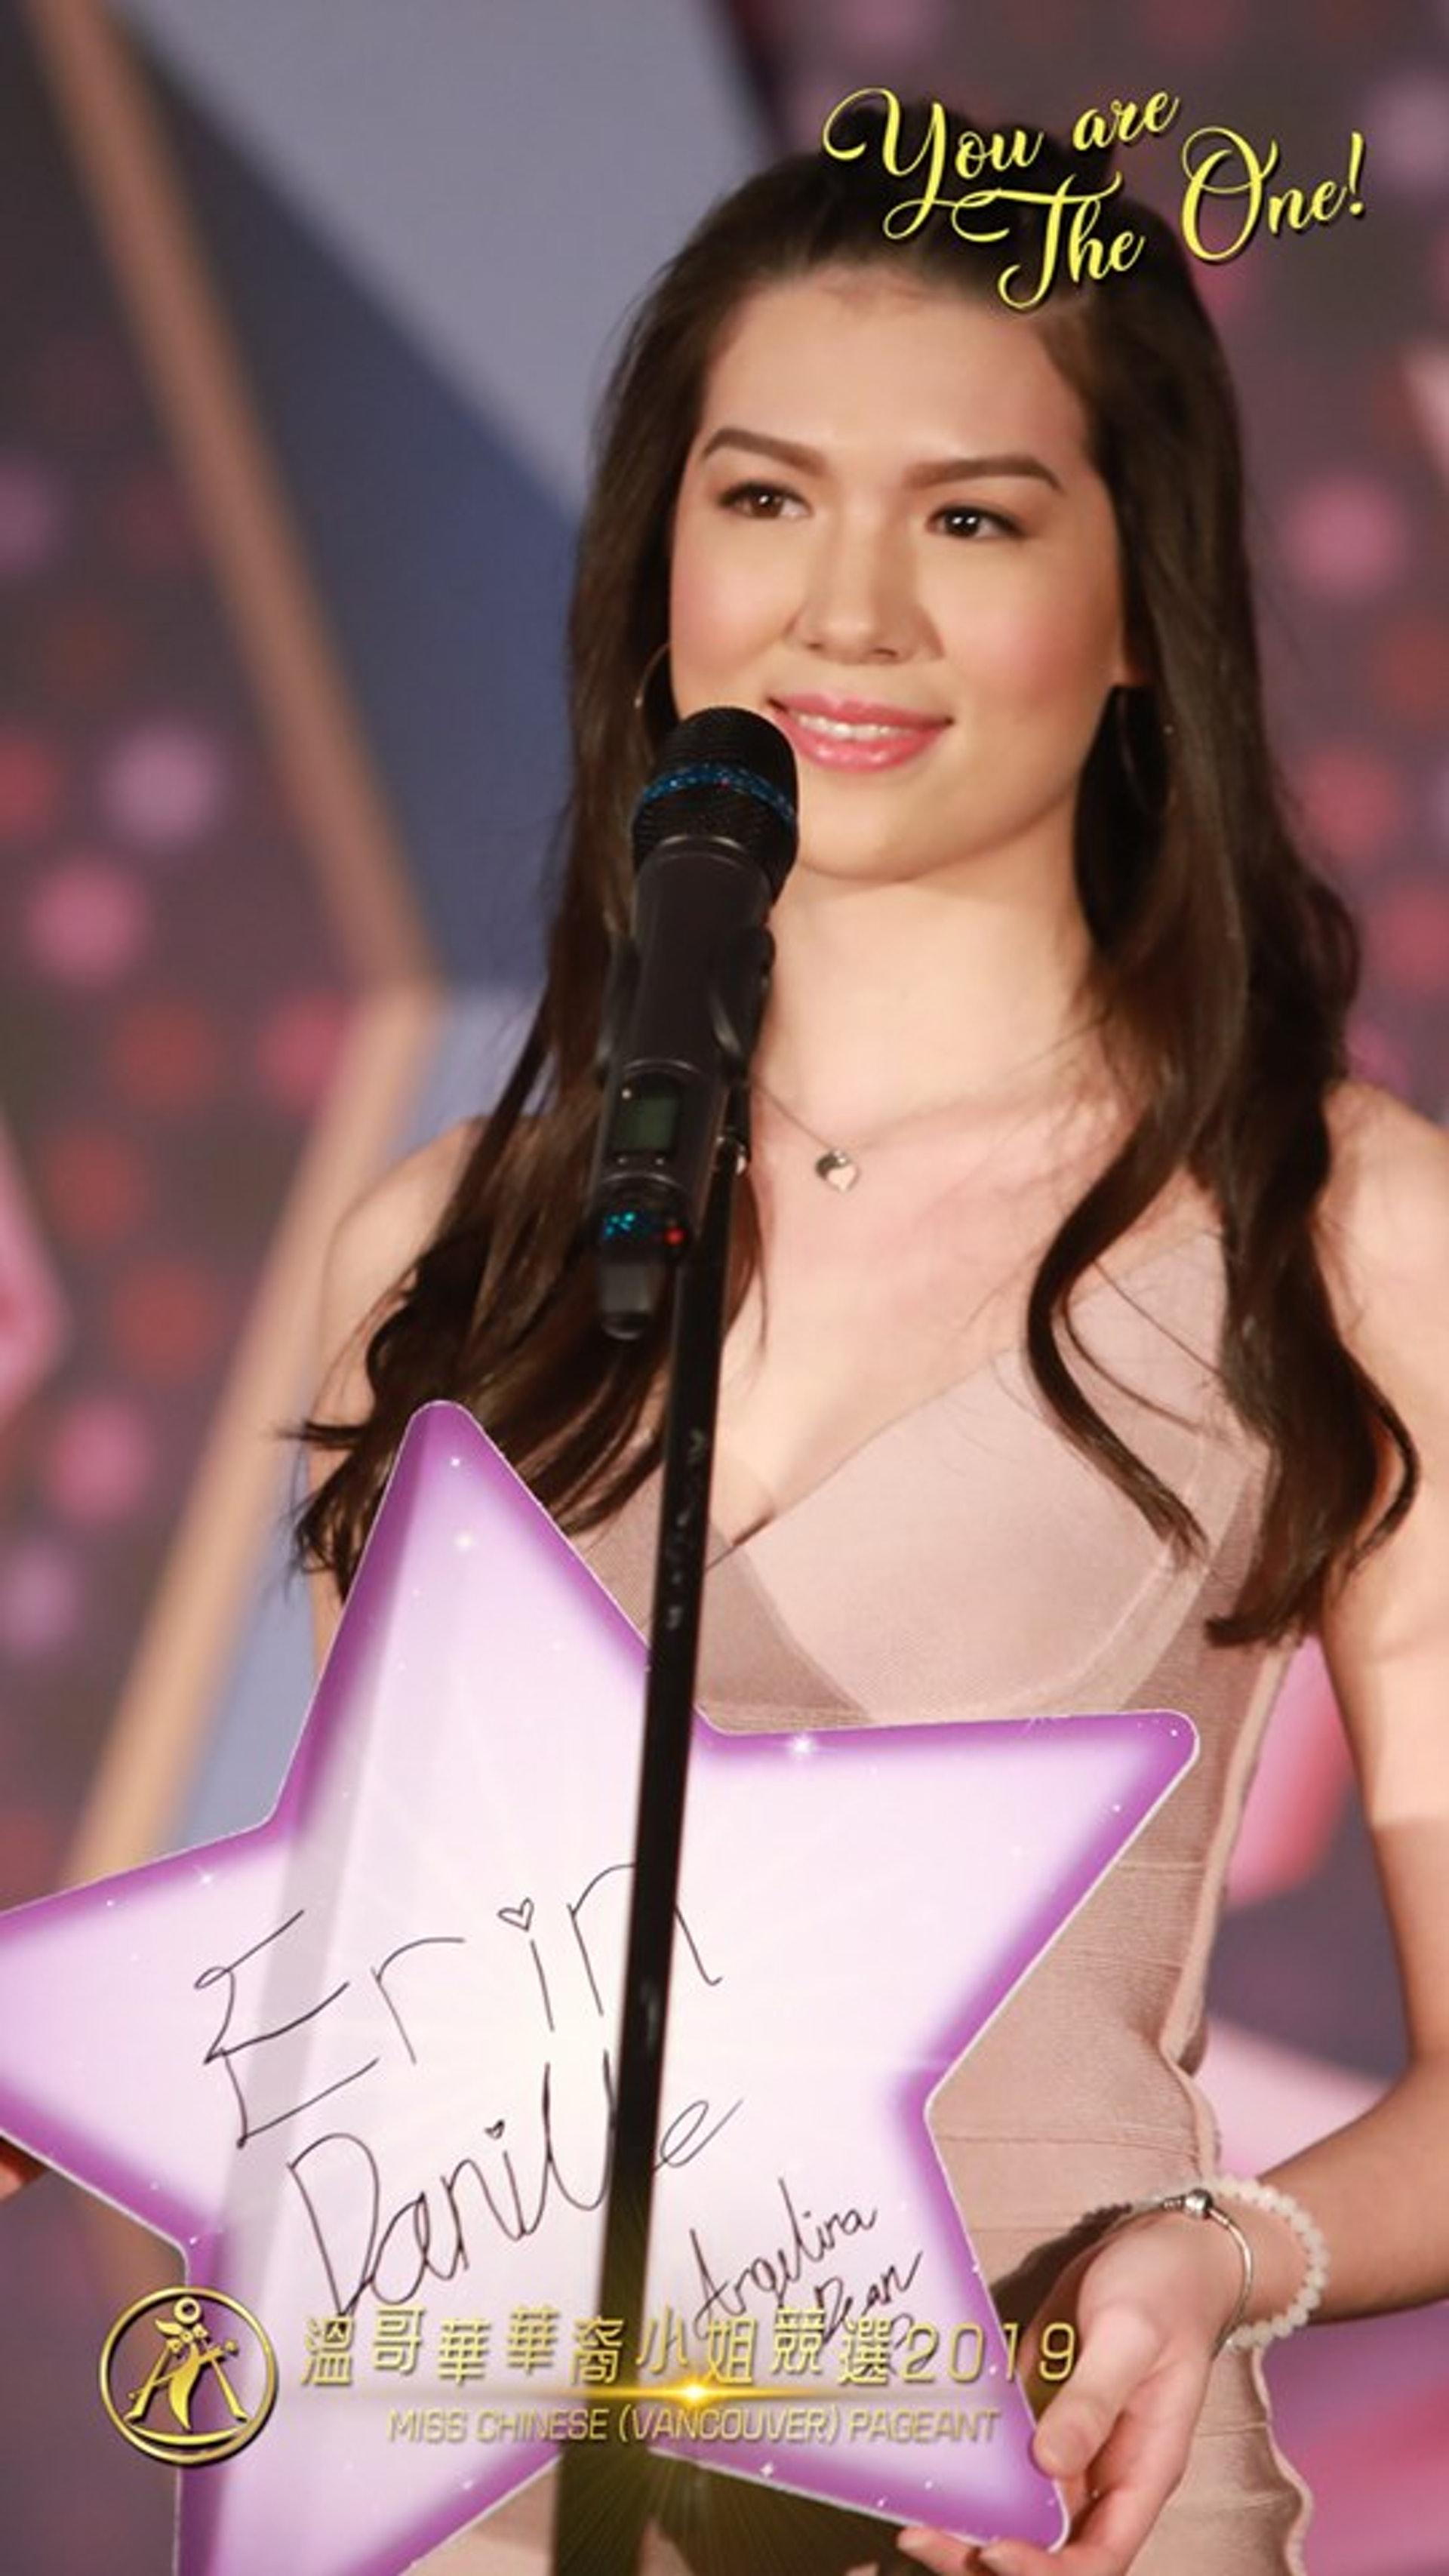 Angelina外表比年紀略成熟一點。(Facebook圖片@溫哥華華裔小姐競選 Miss Chinese (Vancouver) Pageant)